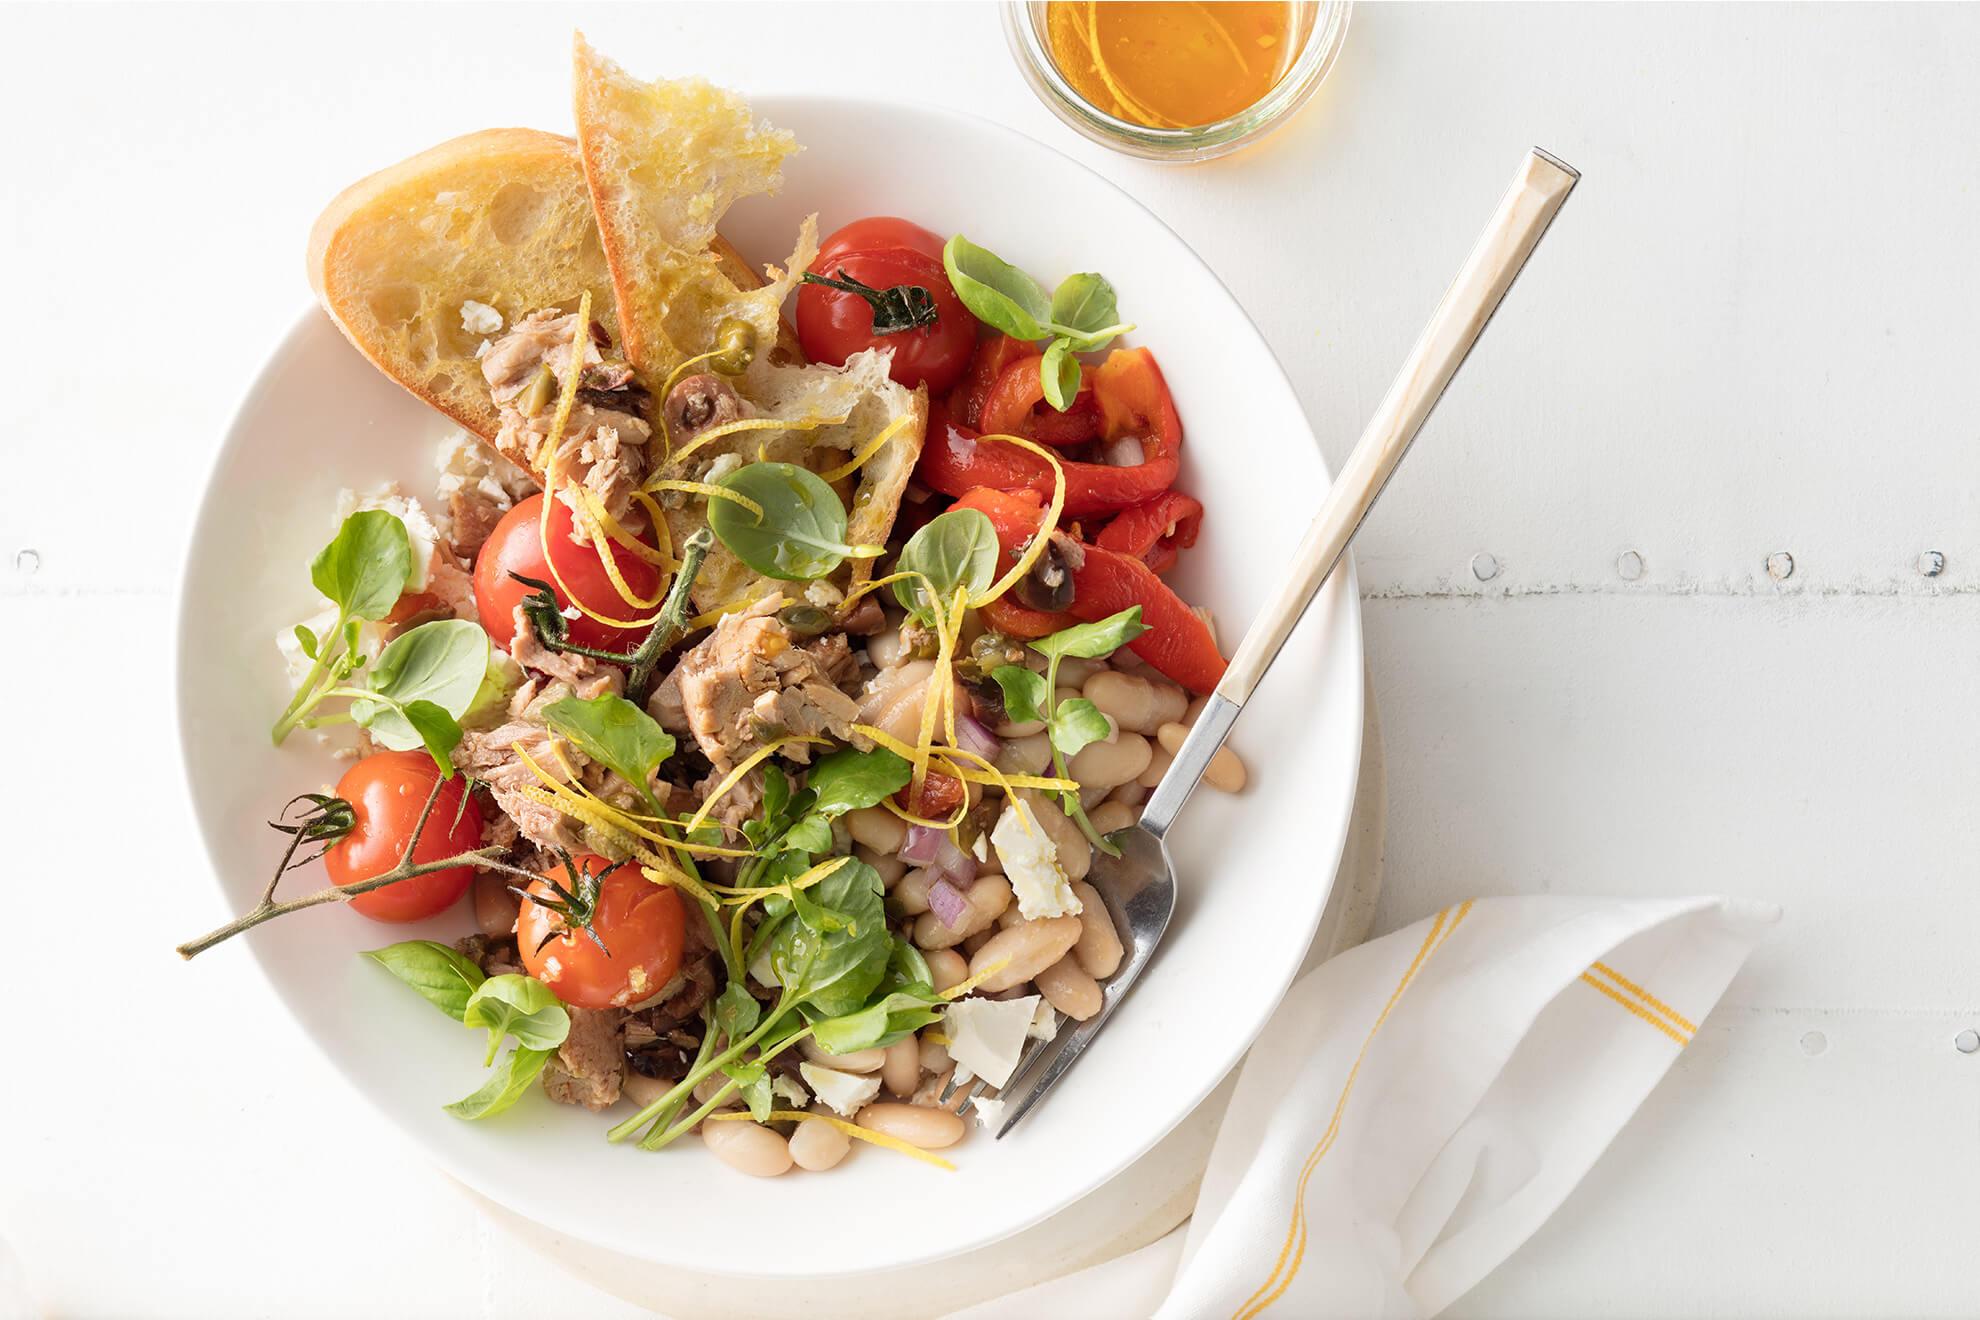 SIRENA Tuna Bruschetta Dinner Bowl